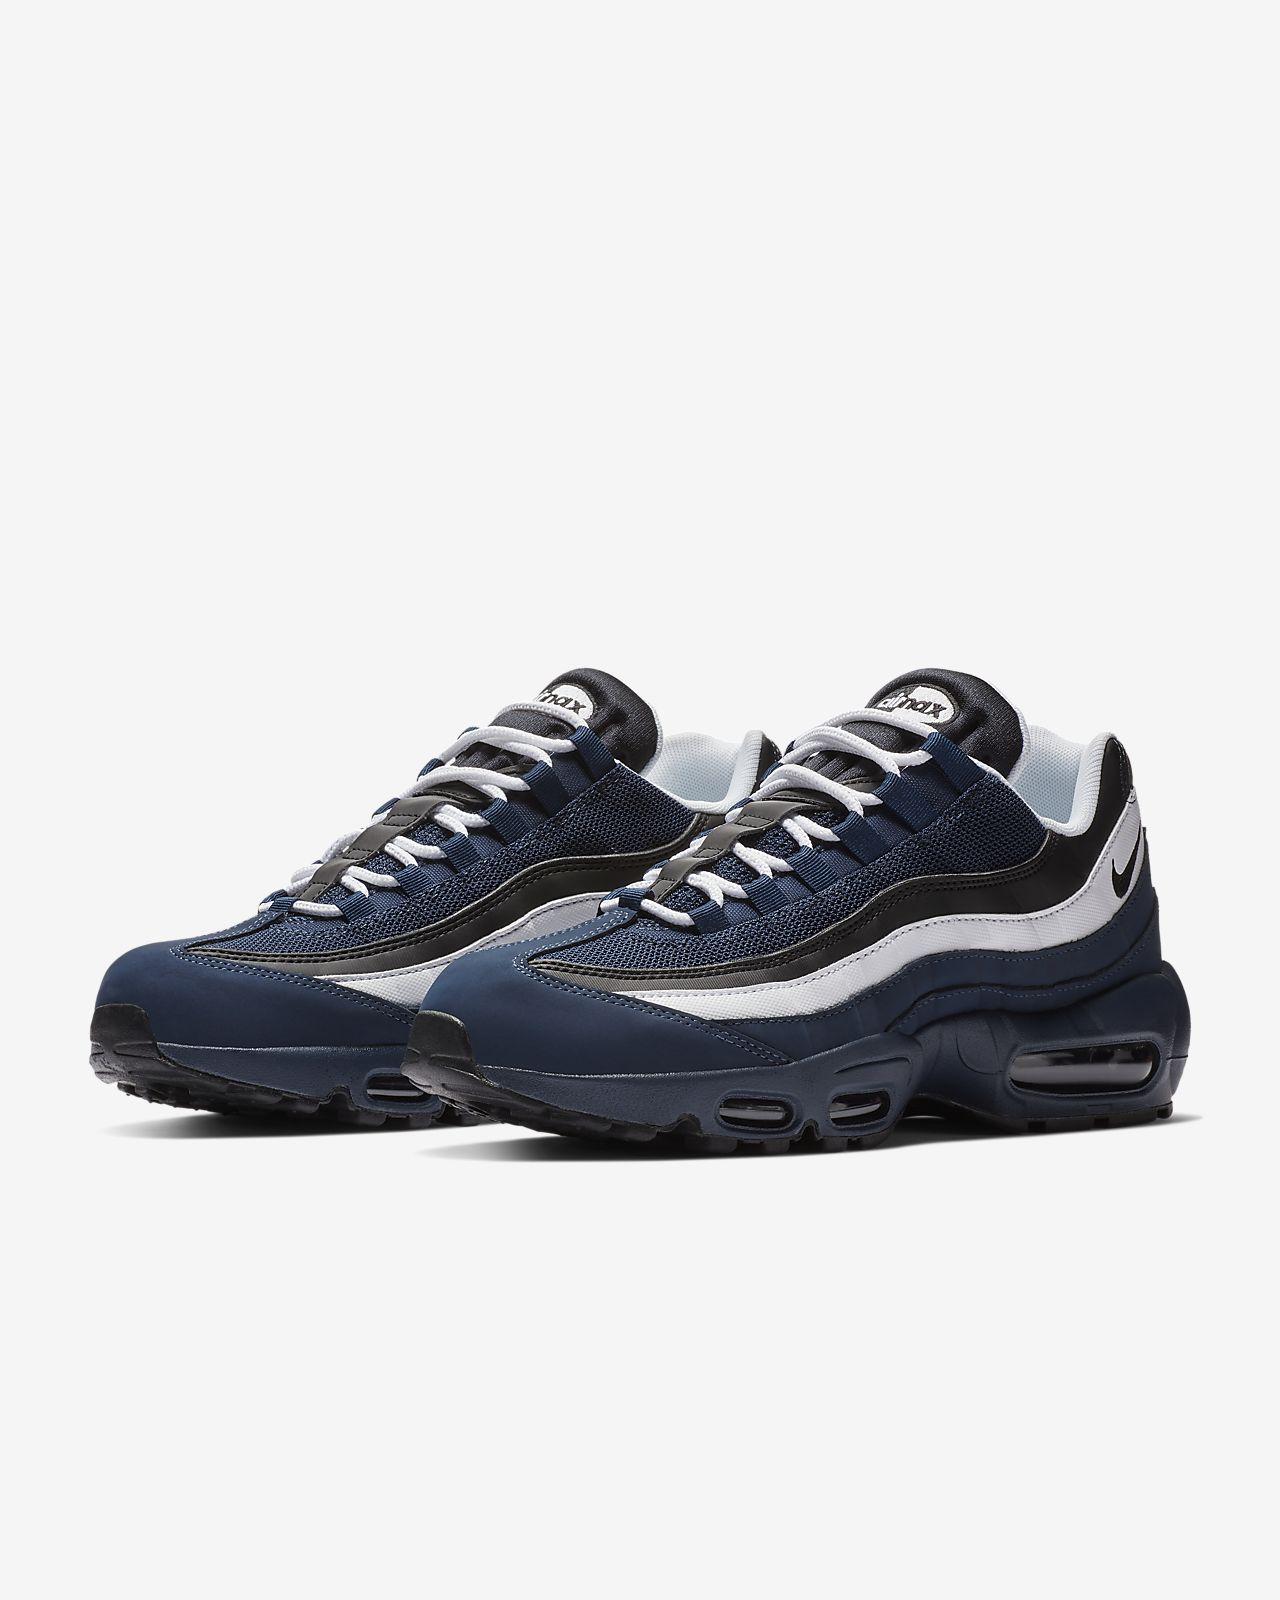 online retailer 7af33 ecbc1 ... Nike Air Max 95 Essential Men s Shoe